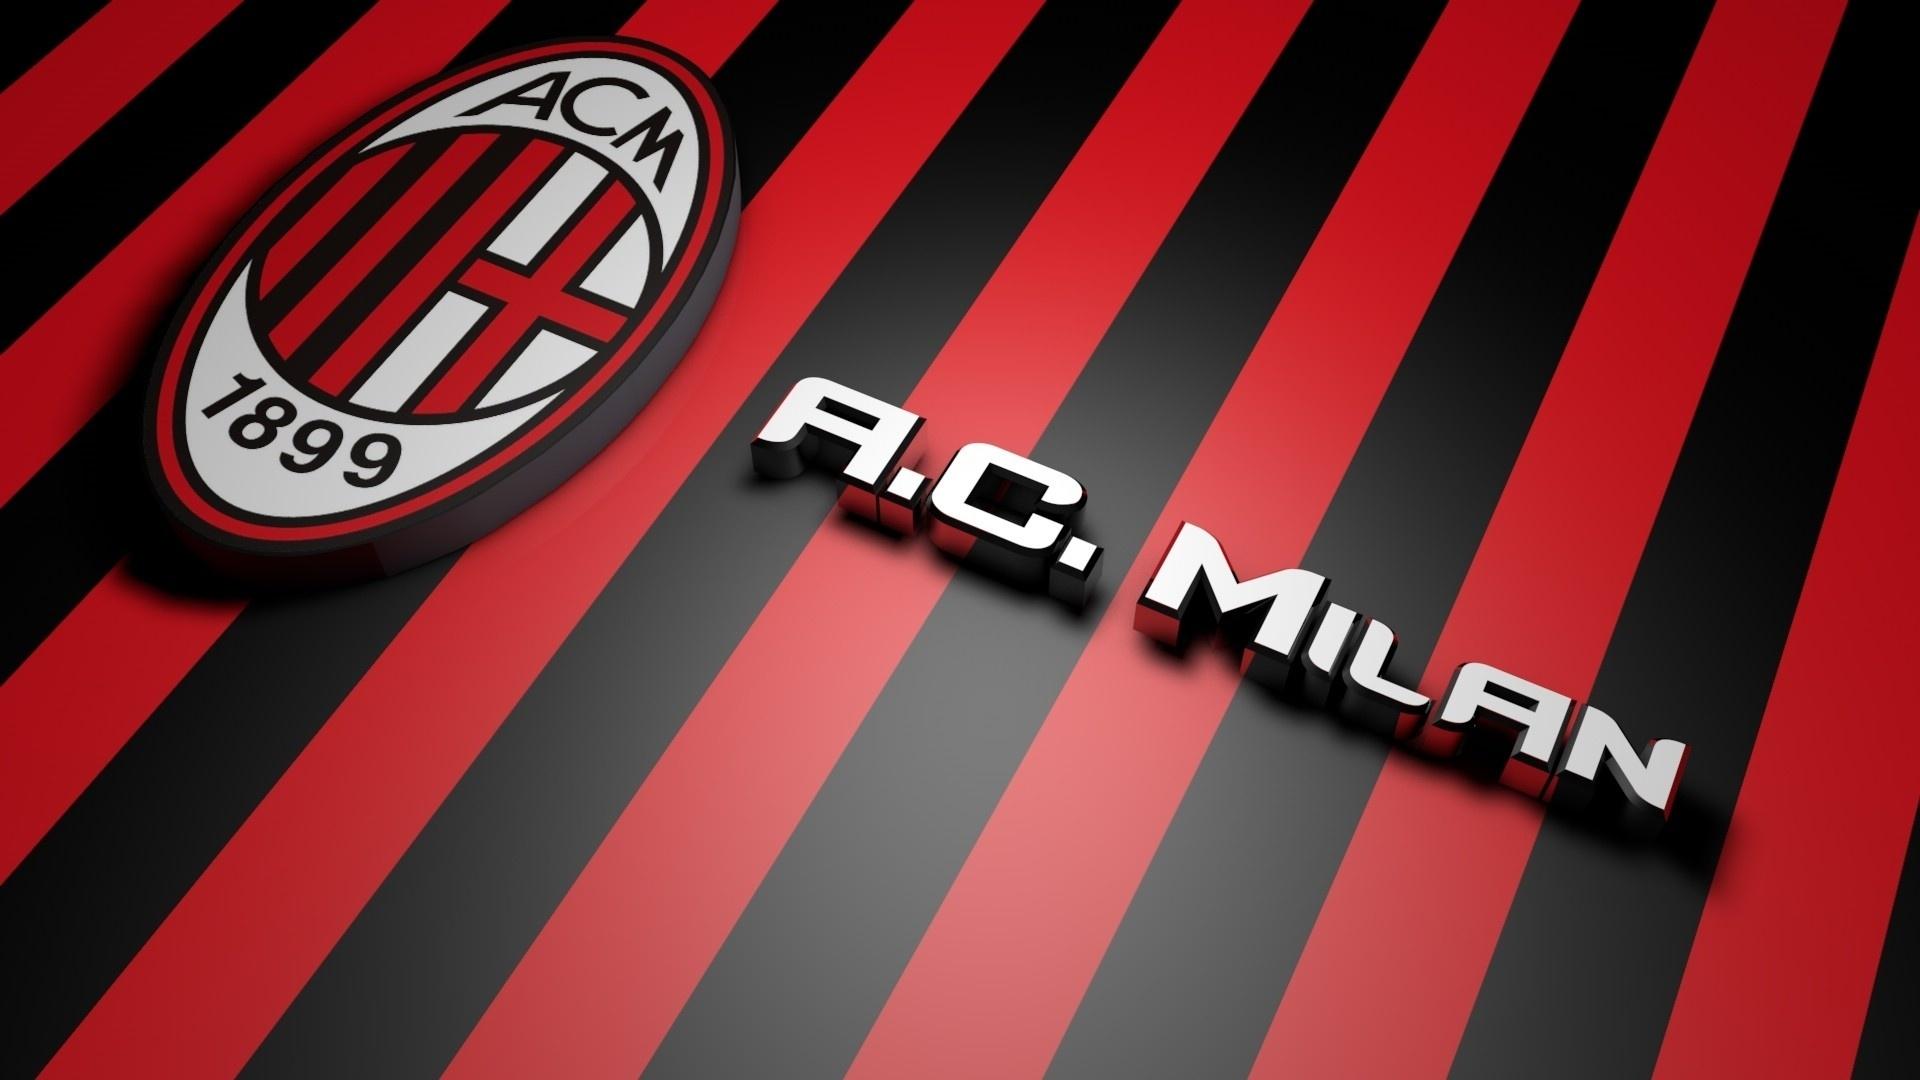 Ac Milan hd desktop wallpaper